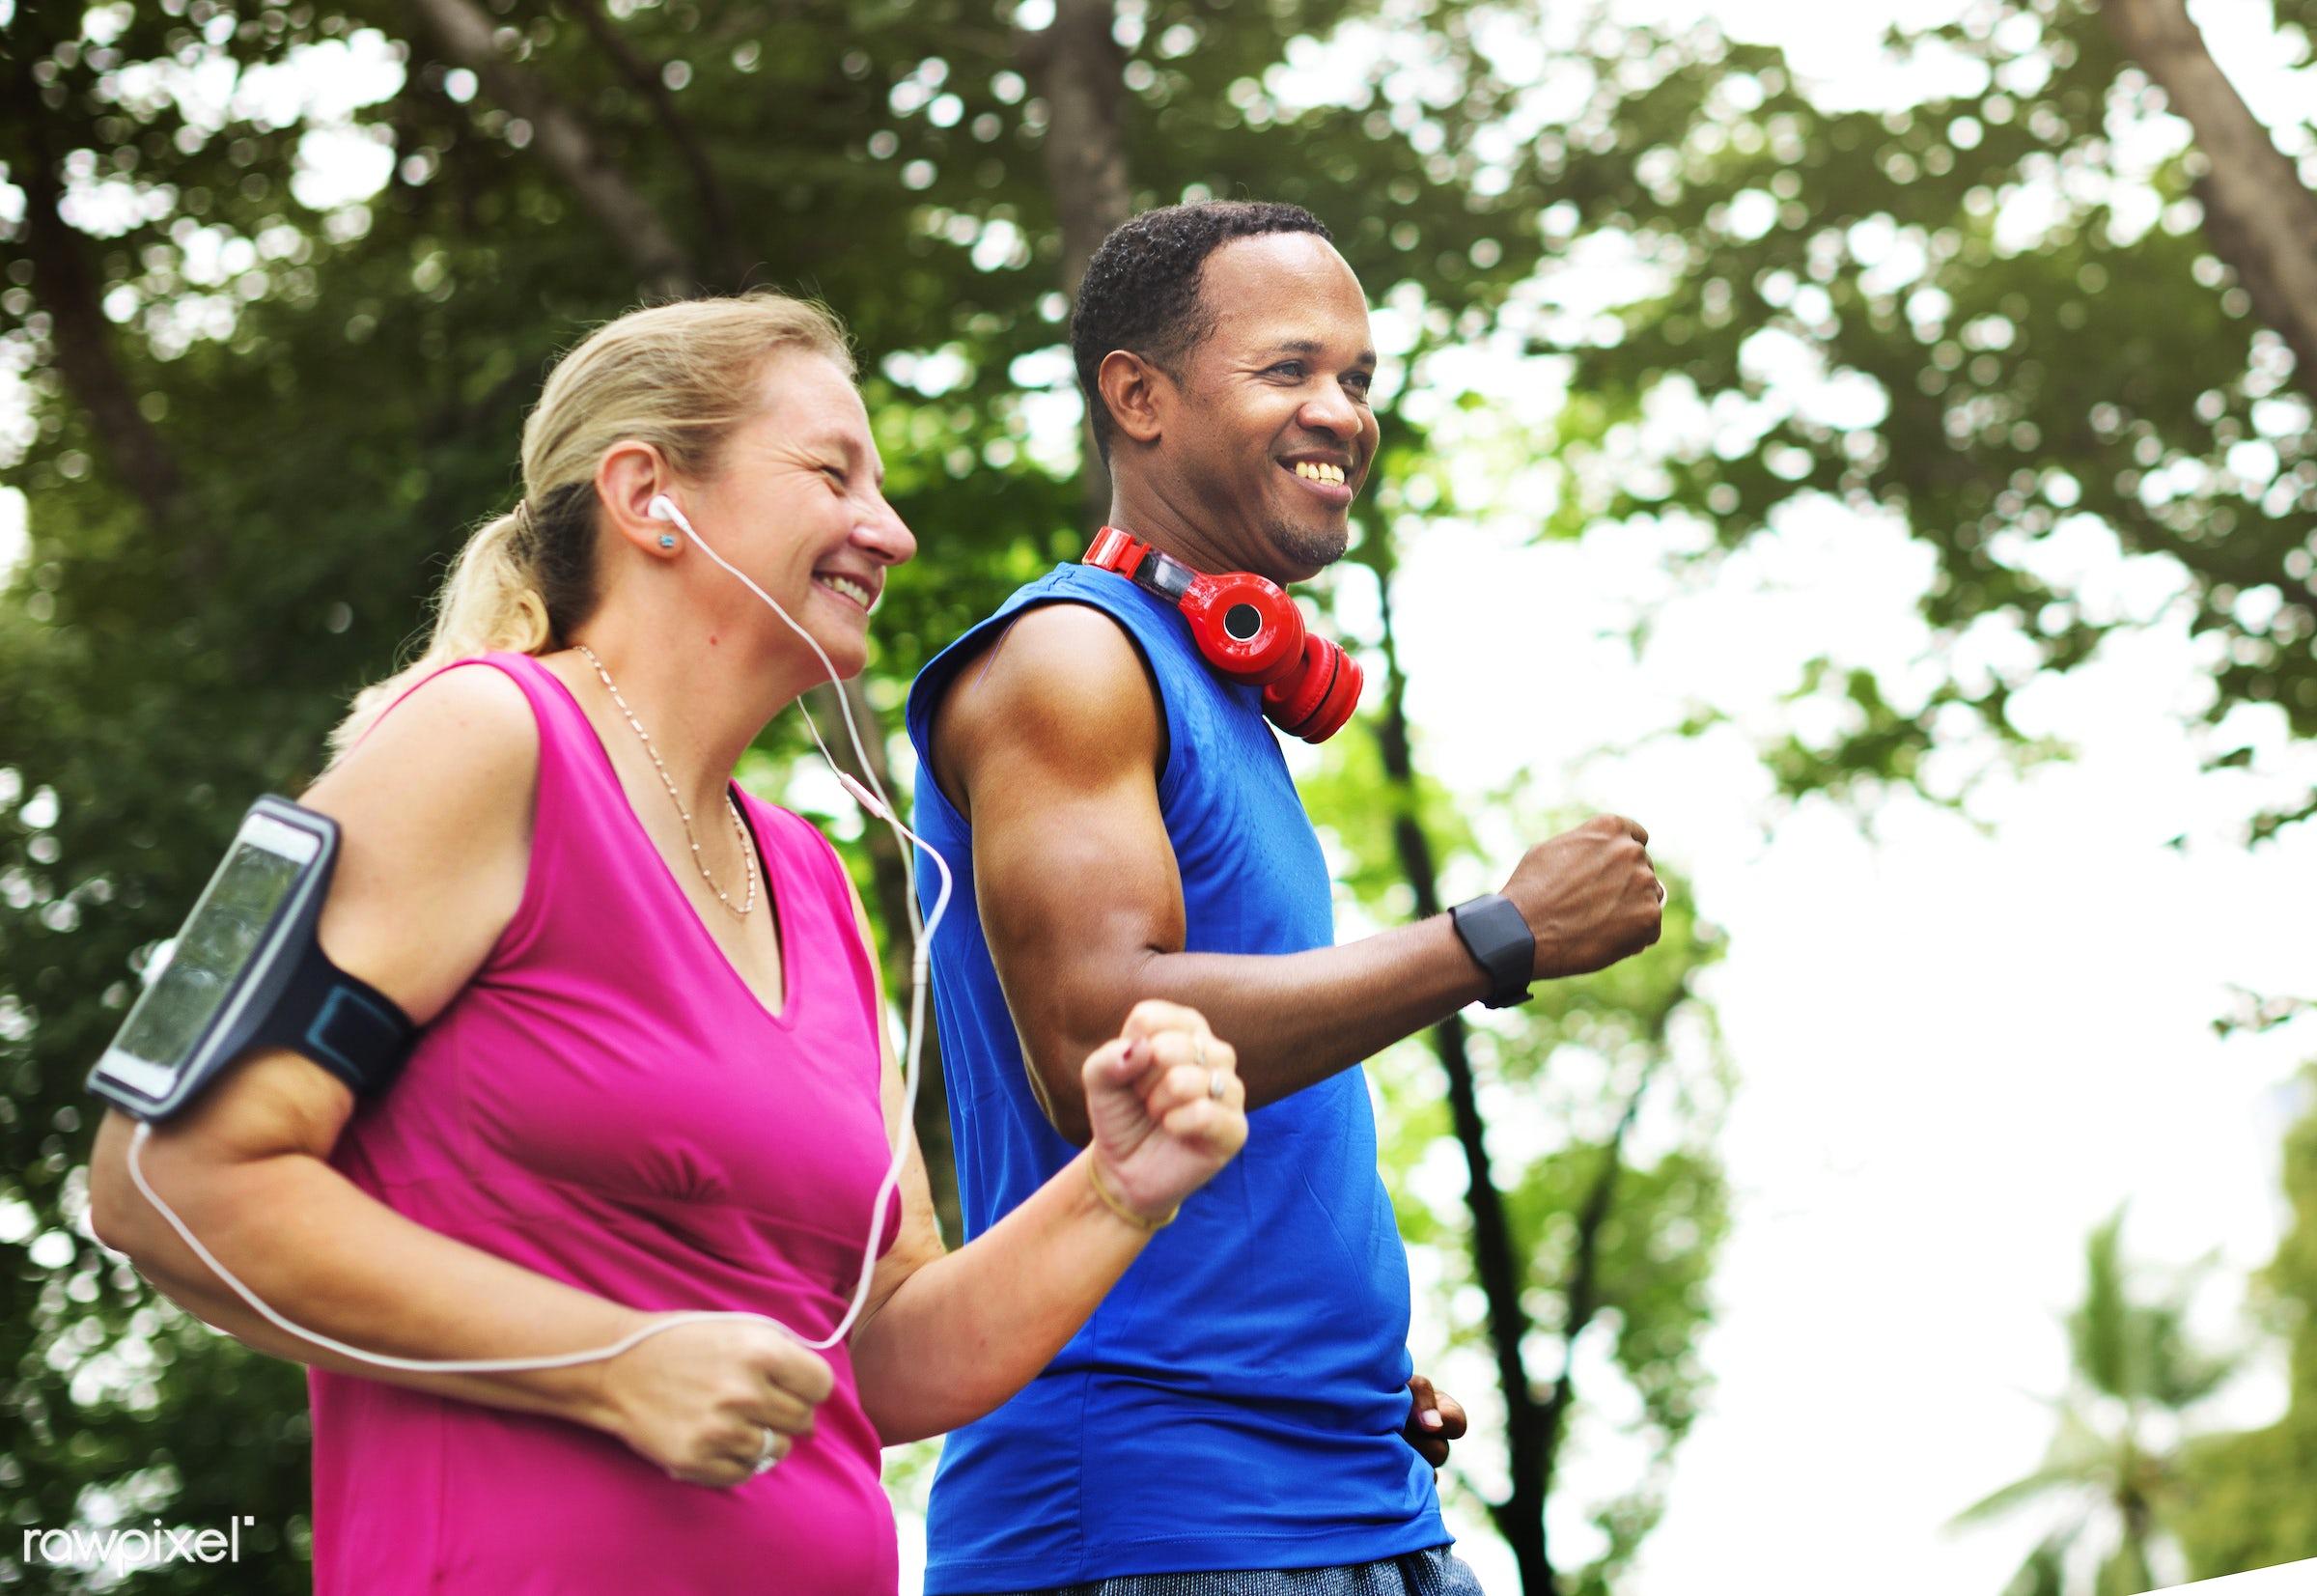 activity, bonding, cheerful, clothing, couple, enjoyment, exercise, exercising, fitness, freshness, happiness, happy, health...